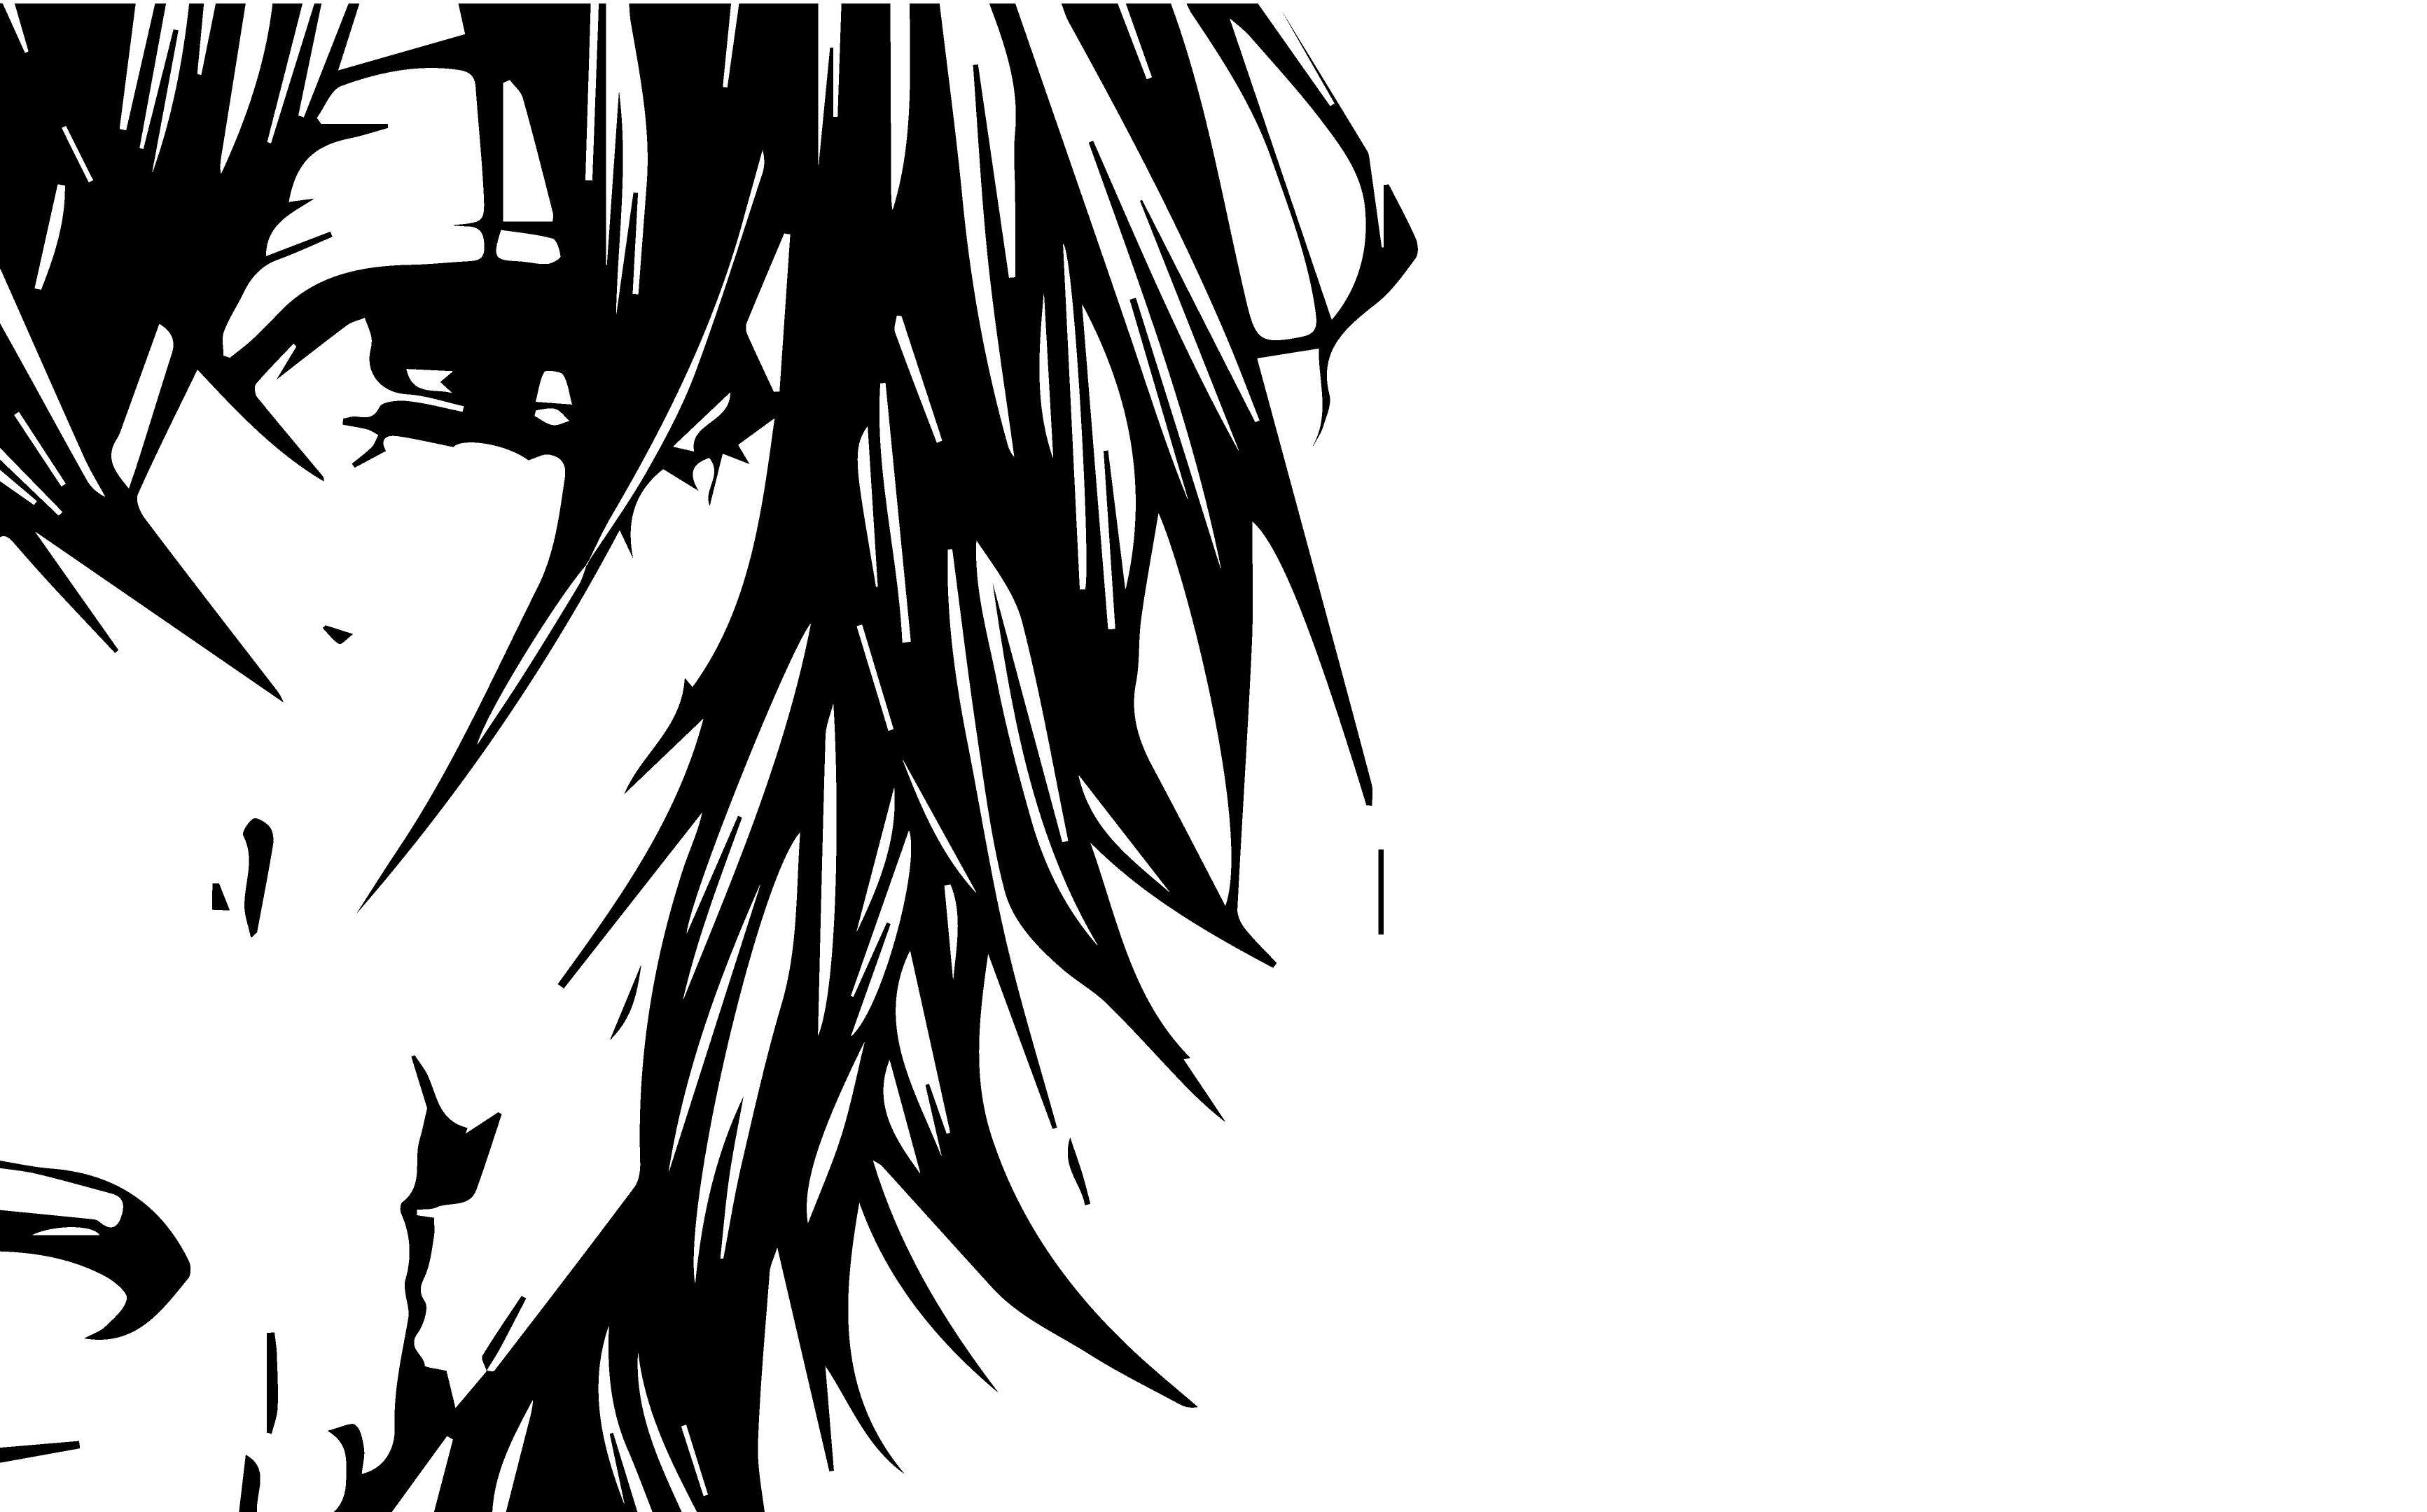 Res: 3466x2160, Sad Anime Wallpapers Hd ✓ Many HD Wallpaper